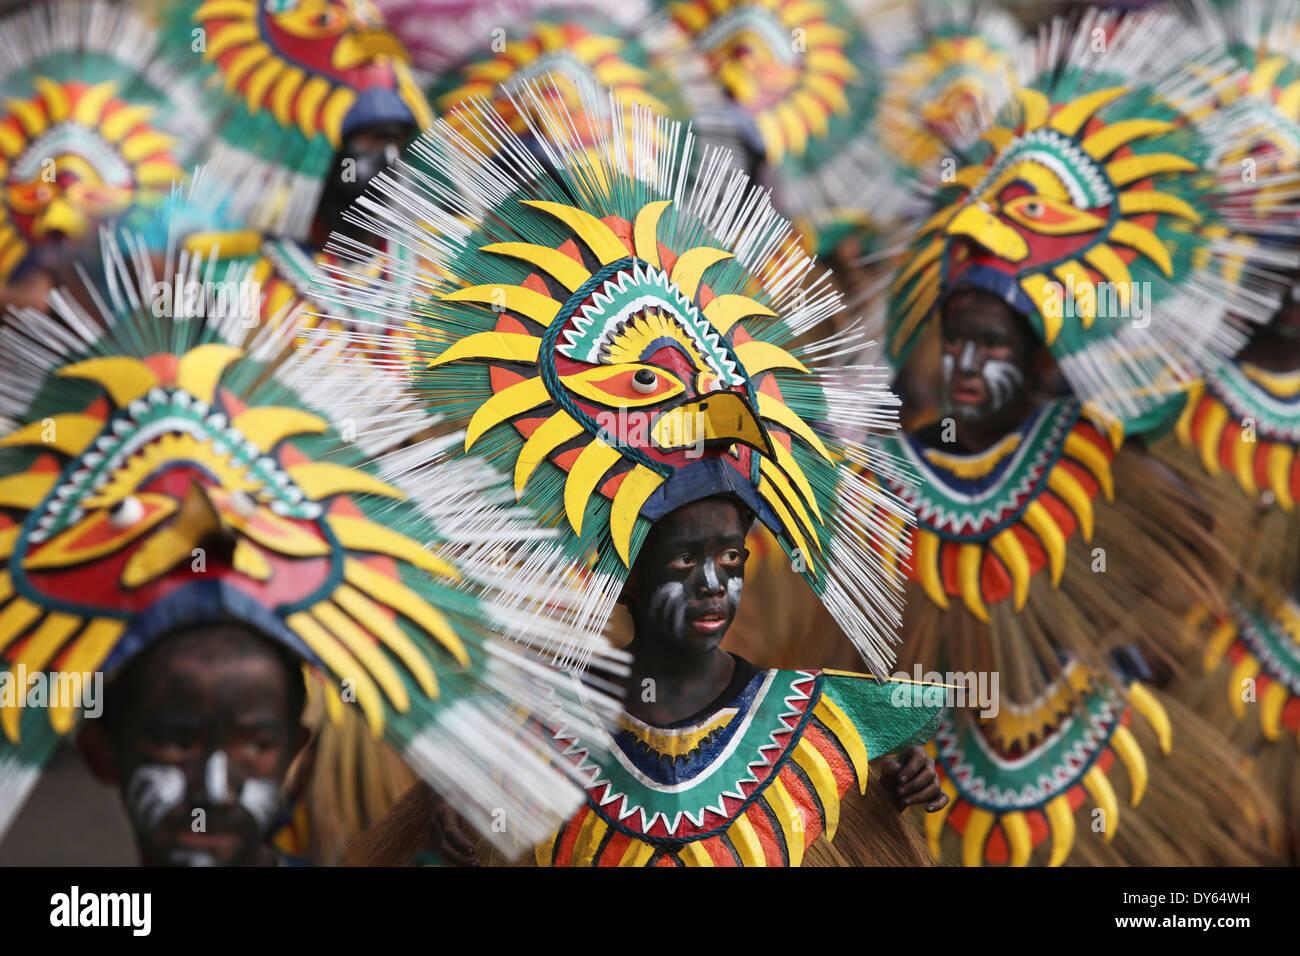 Boys at the Ati Atihan Festival wearing clothes, Kalibo Aklan Panay Island, Philippines Stock Photo